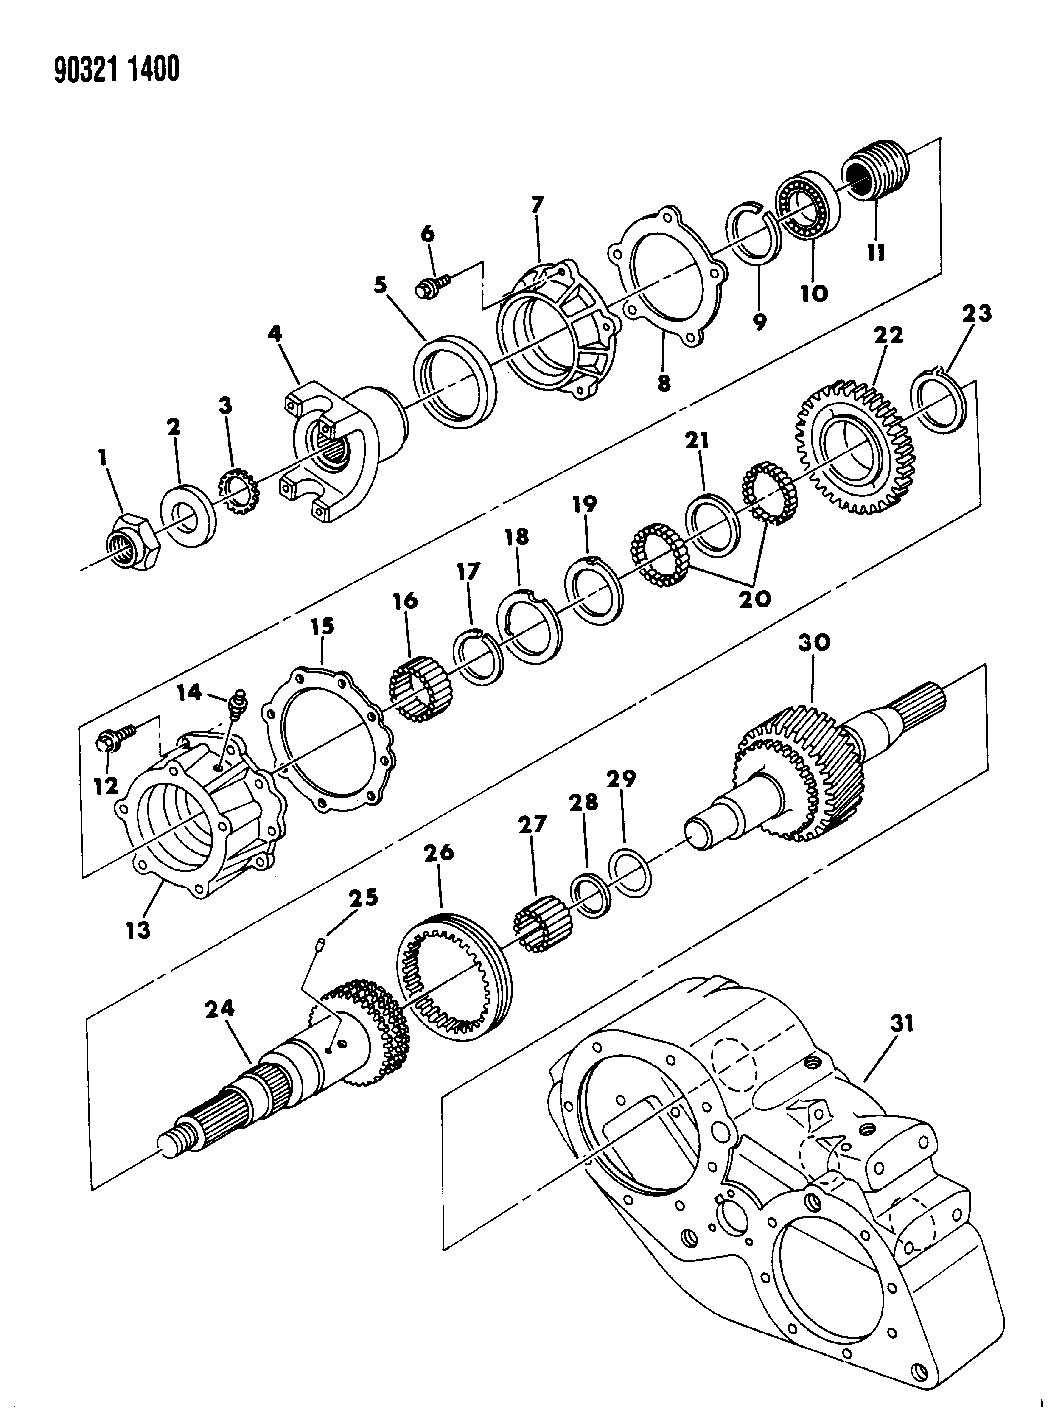 jeep cherokee speedometer problems